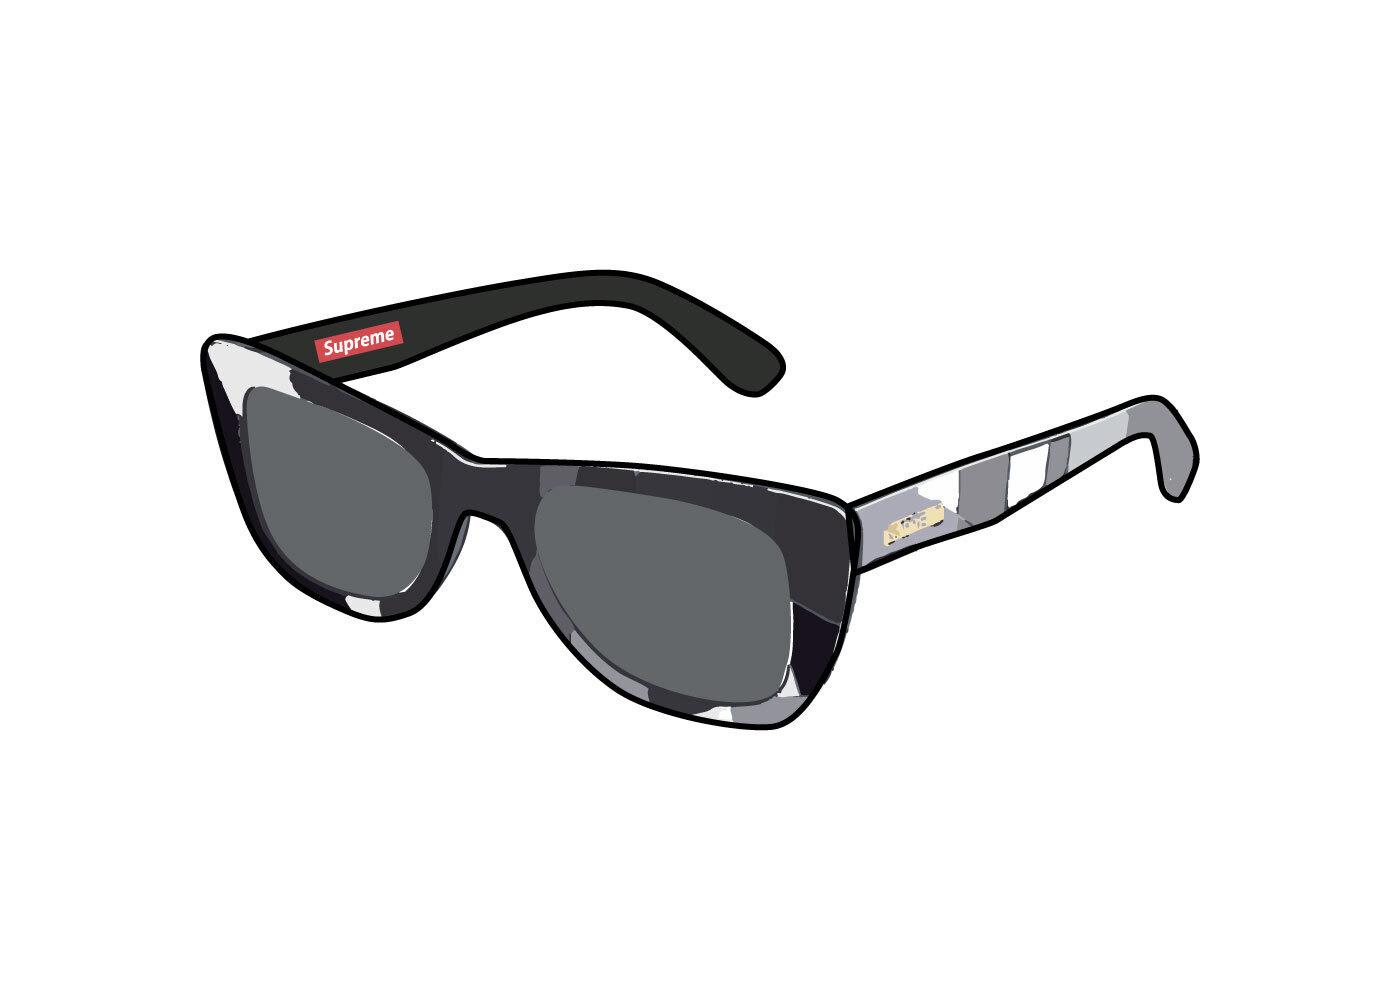 Supreme Emilio Pucci Cat Sunglasses Black (SS21)の写真